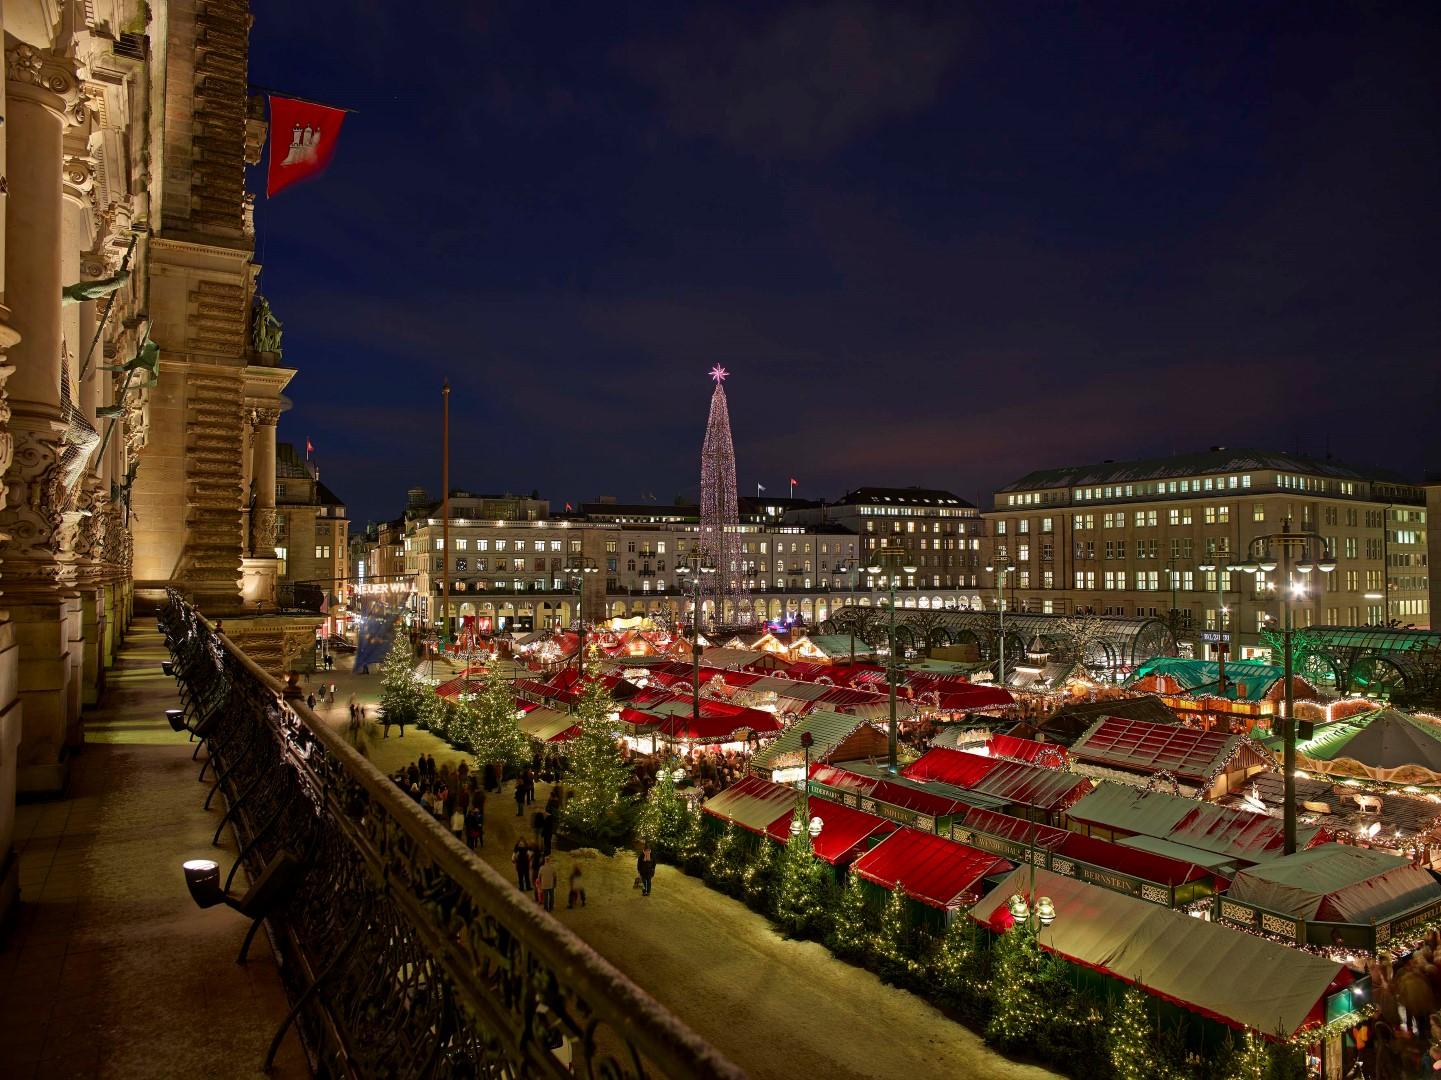 mercadillos de navidad Weihnachtsmarkt vom Rathaus Balkon/christmas market town hall